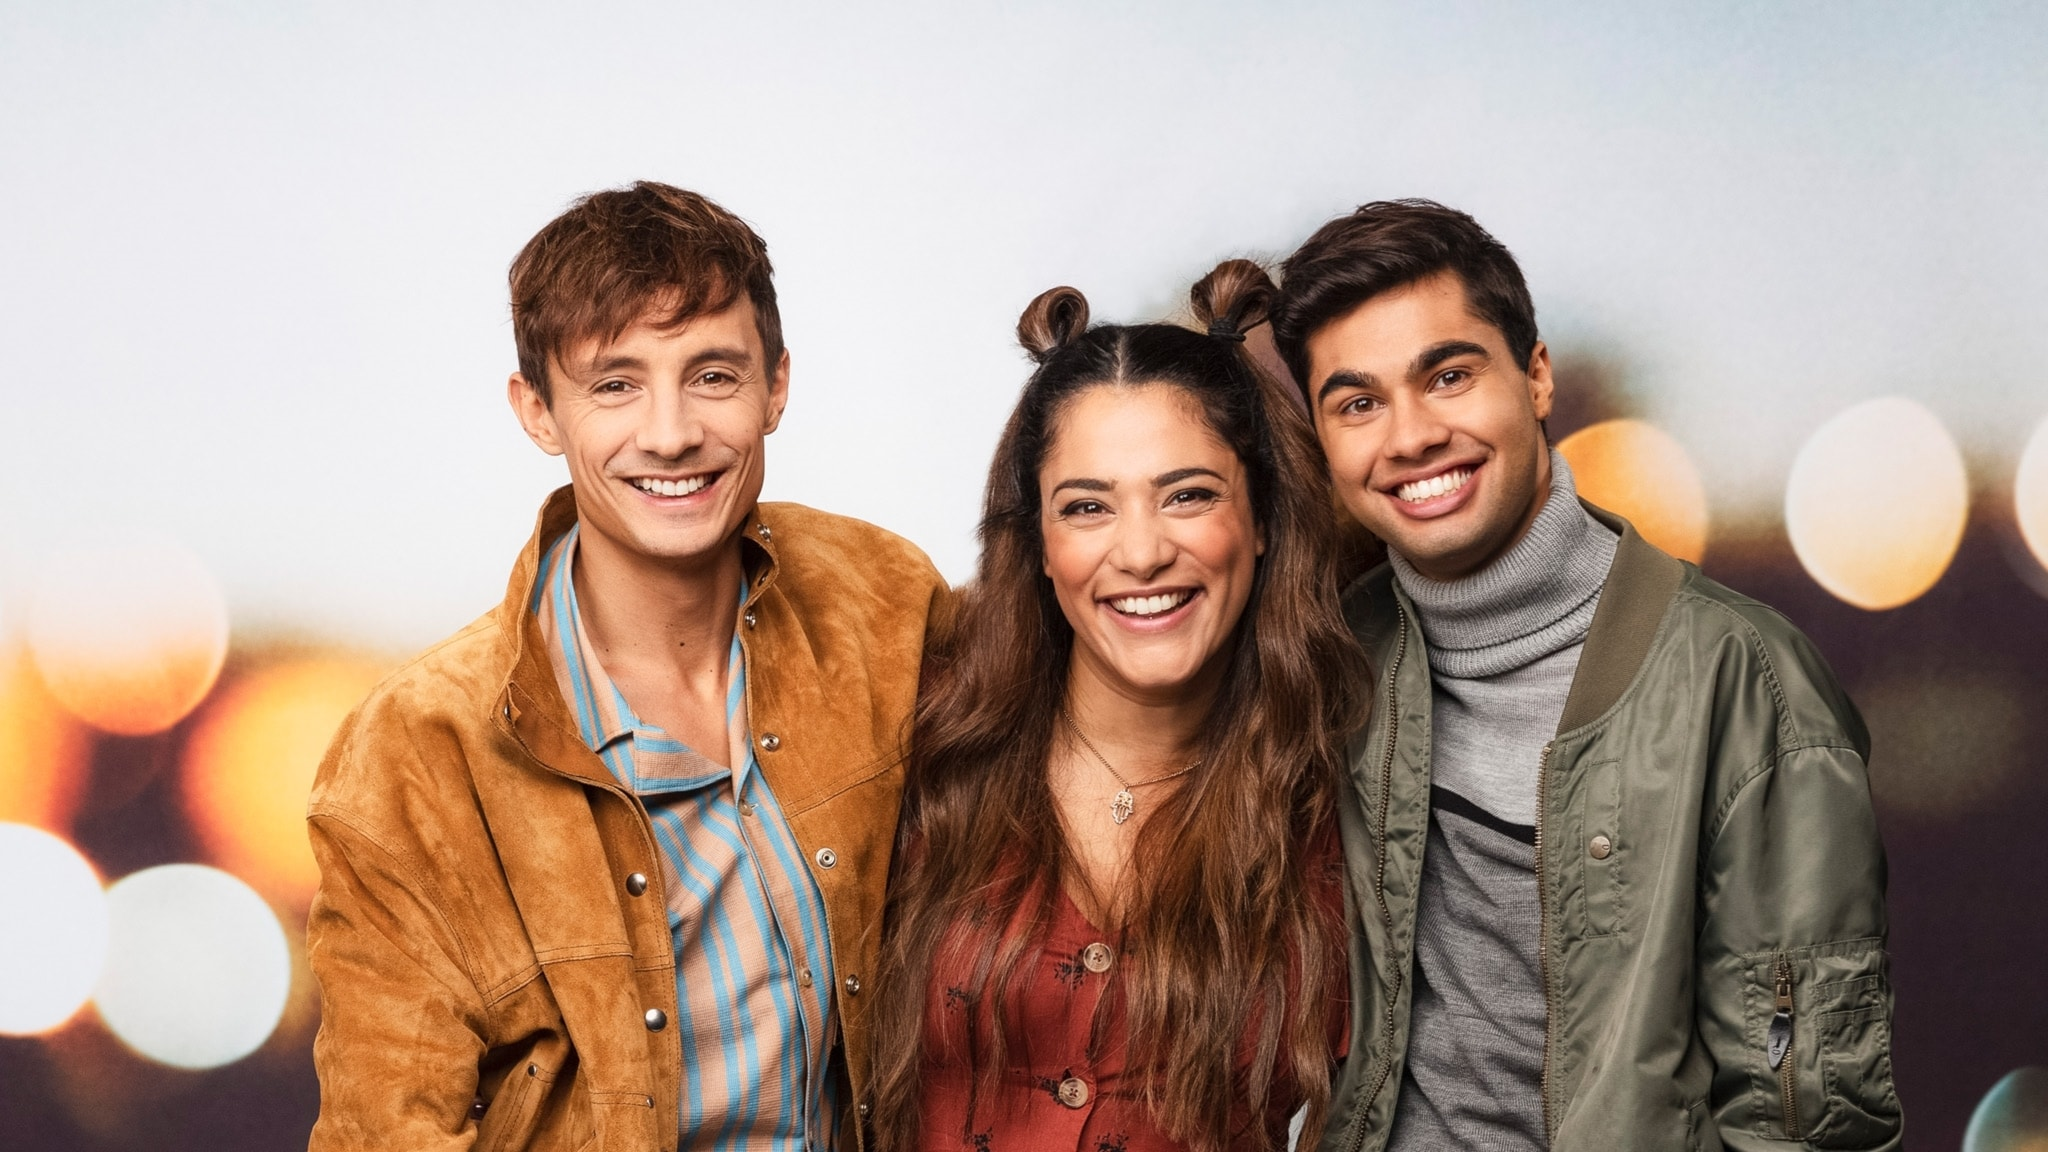 Musikhjälpen 2018: Lördag